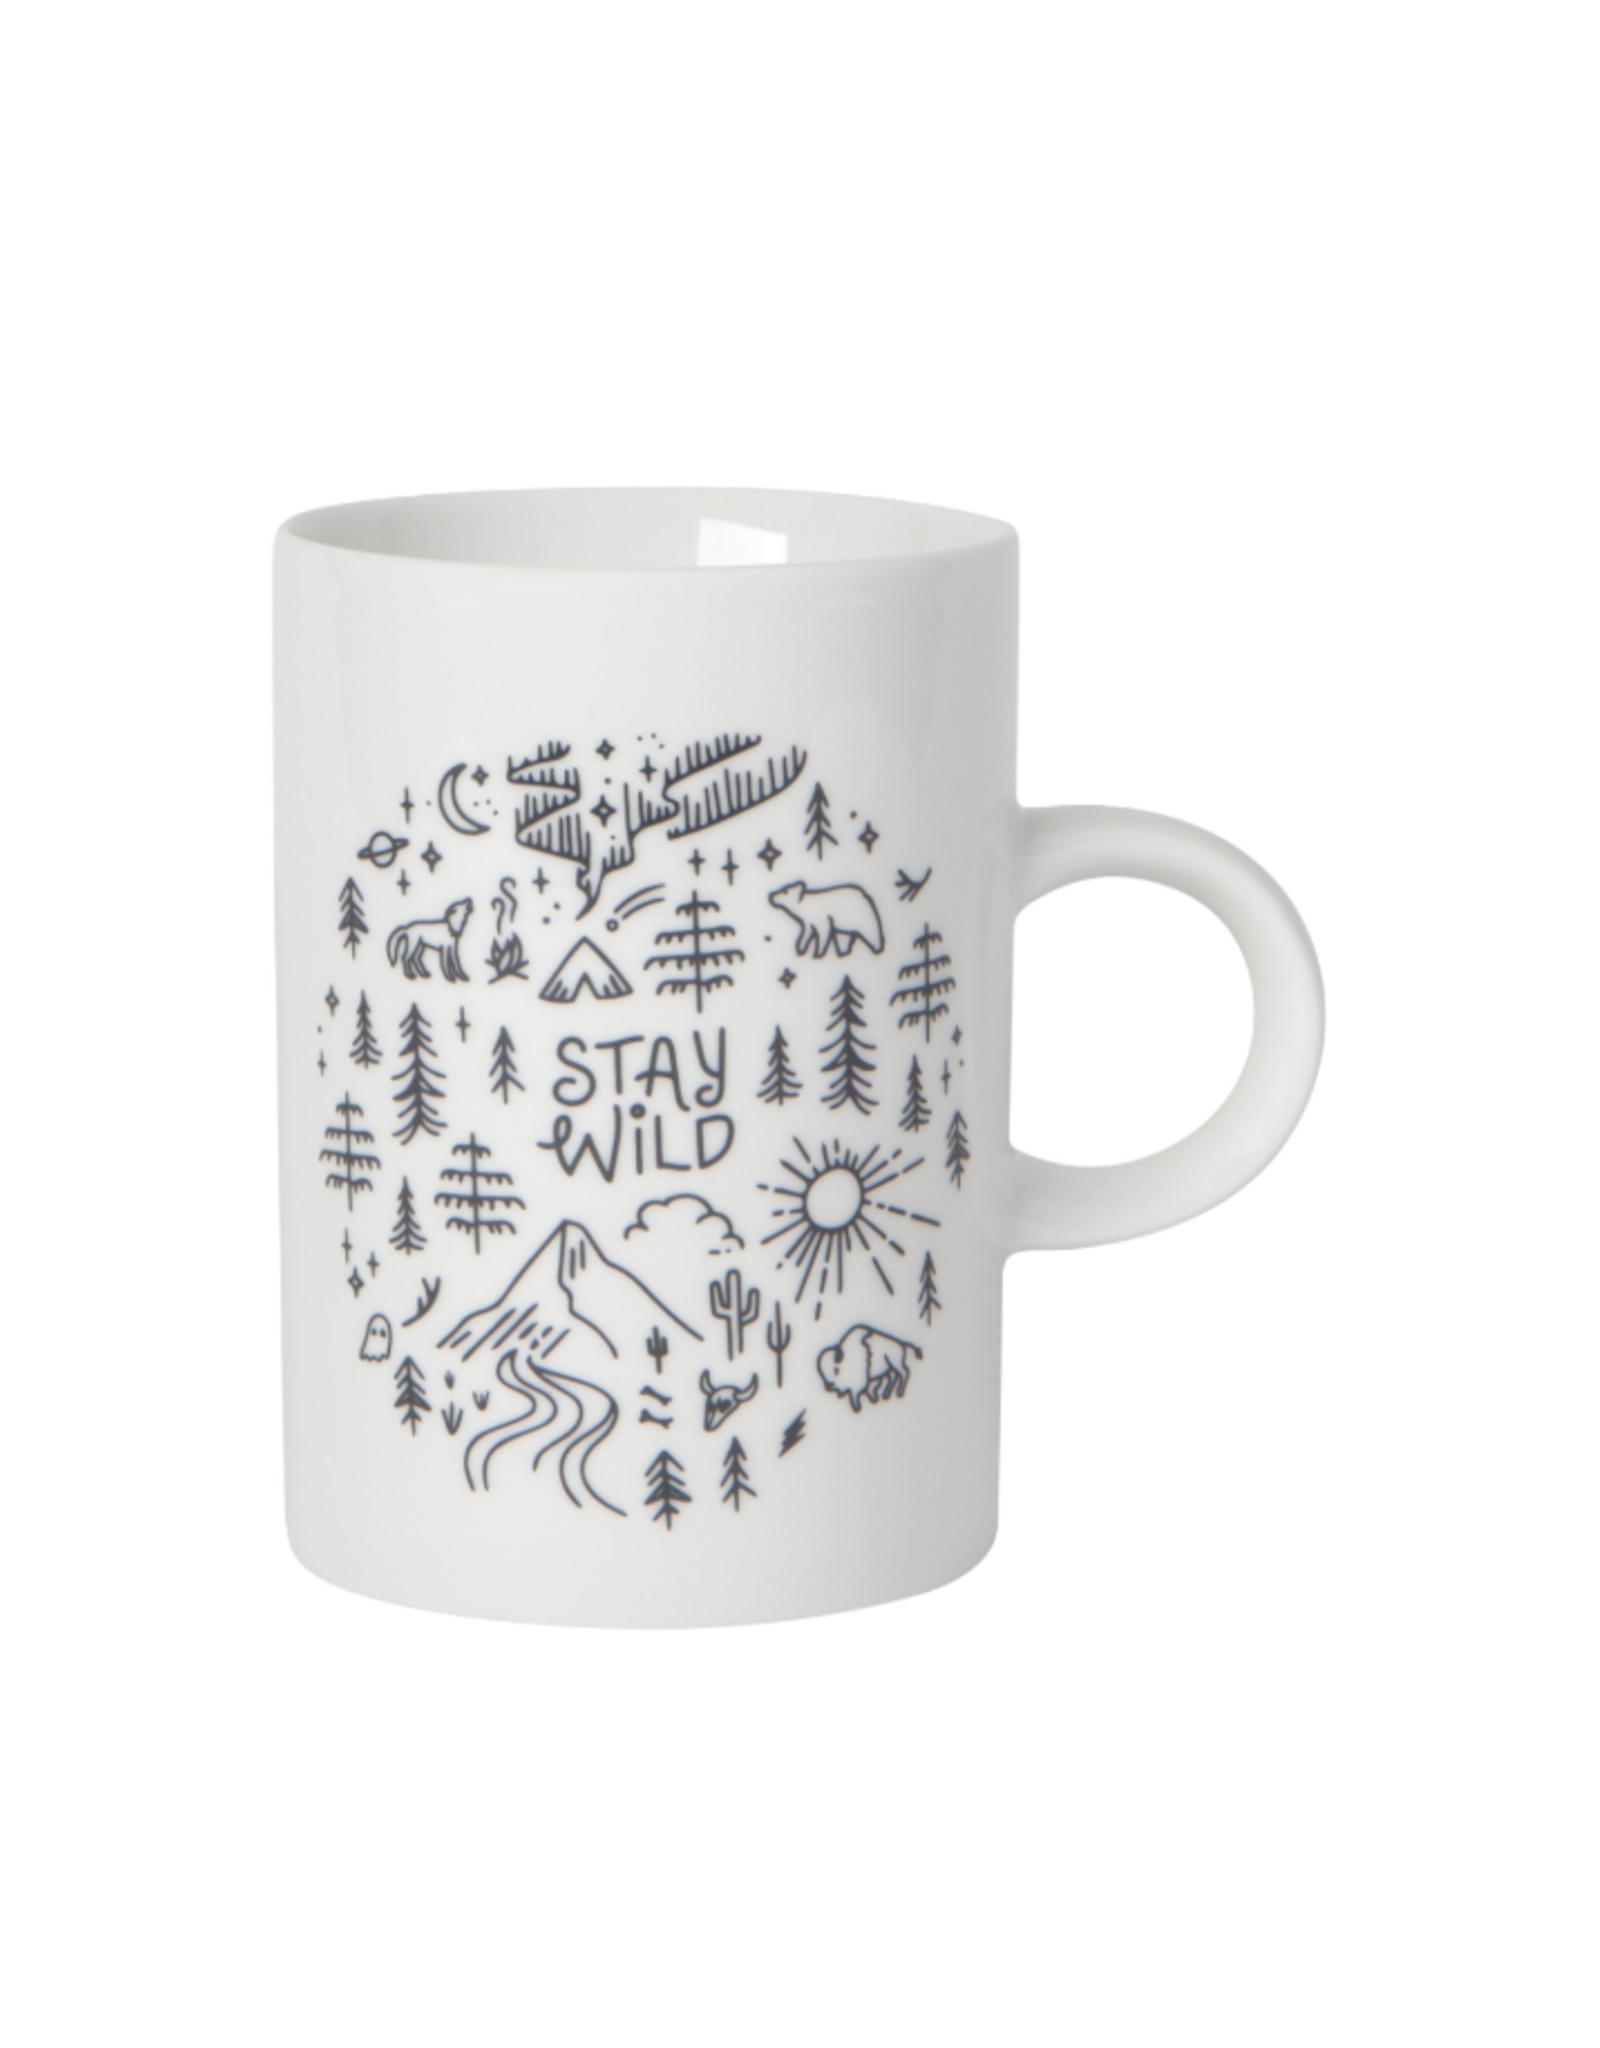 Now Designs Mug, Tall, Stay Wild